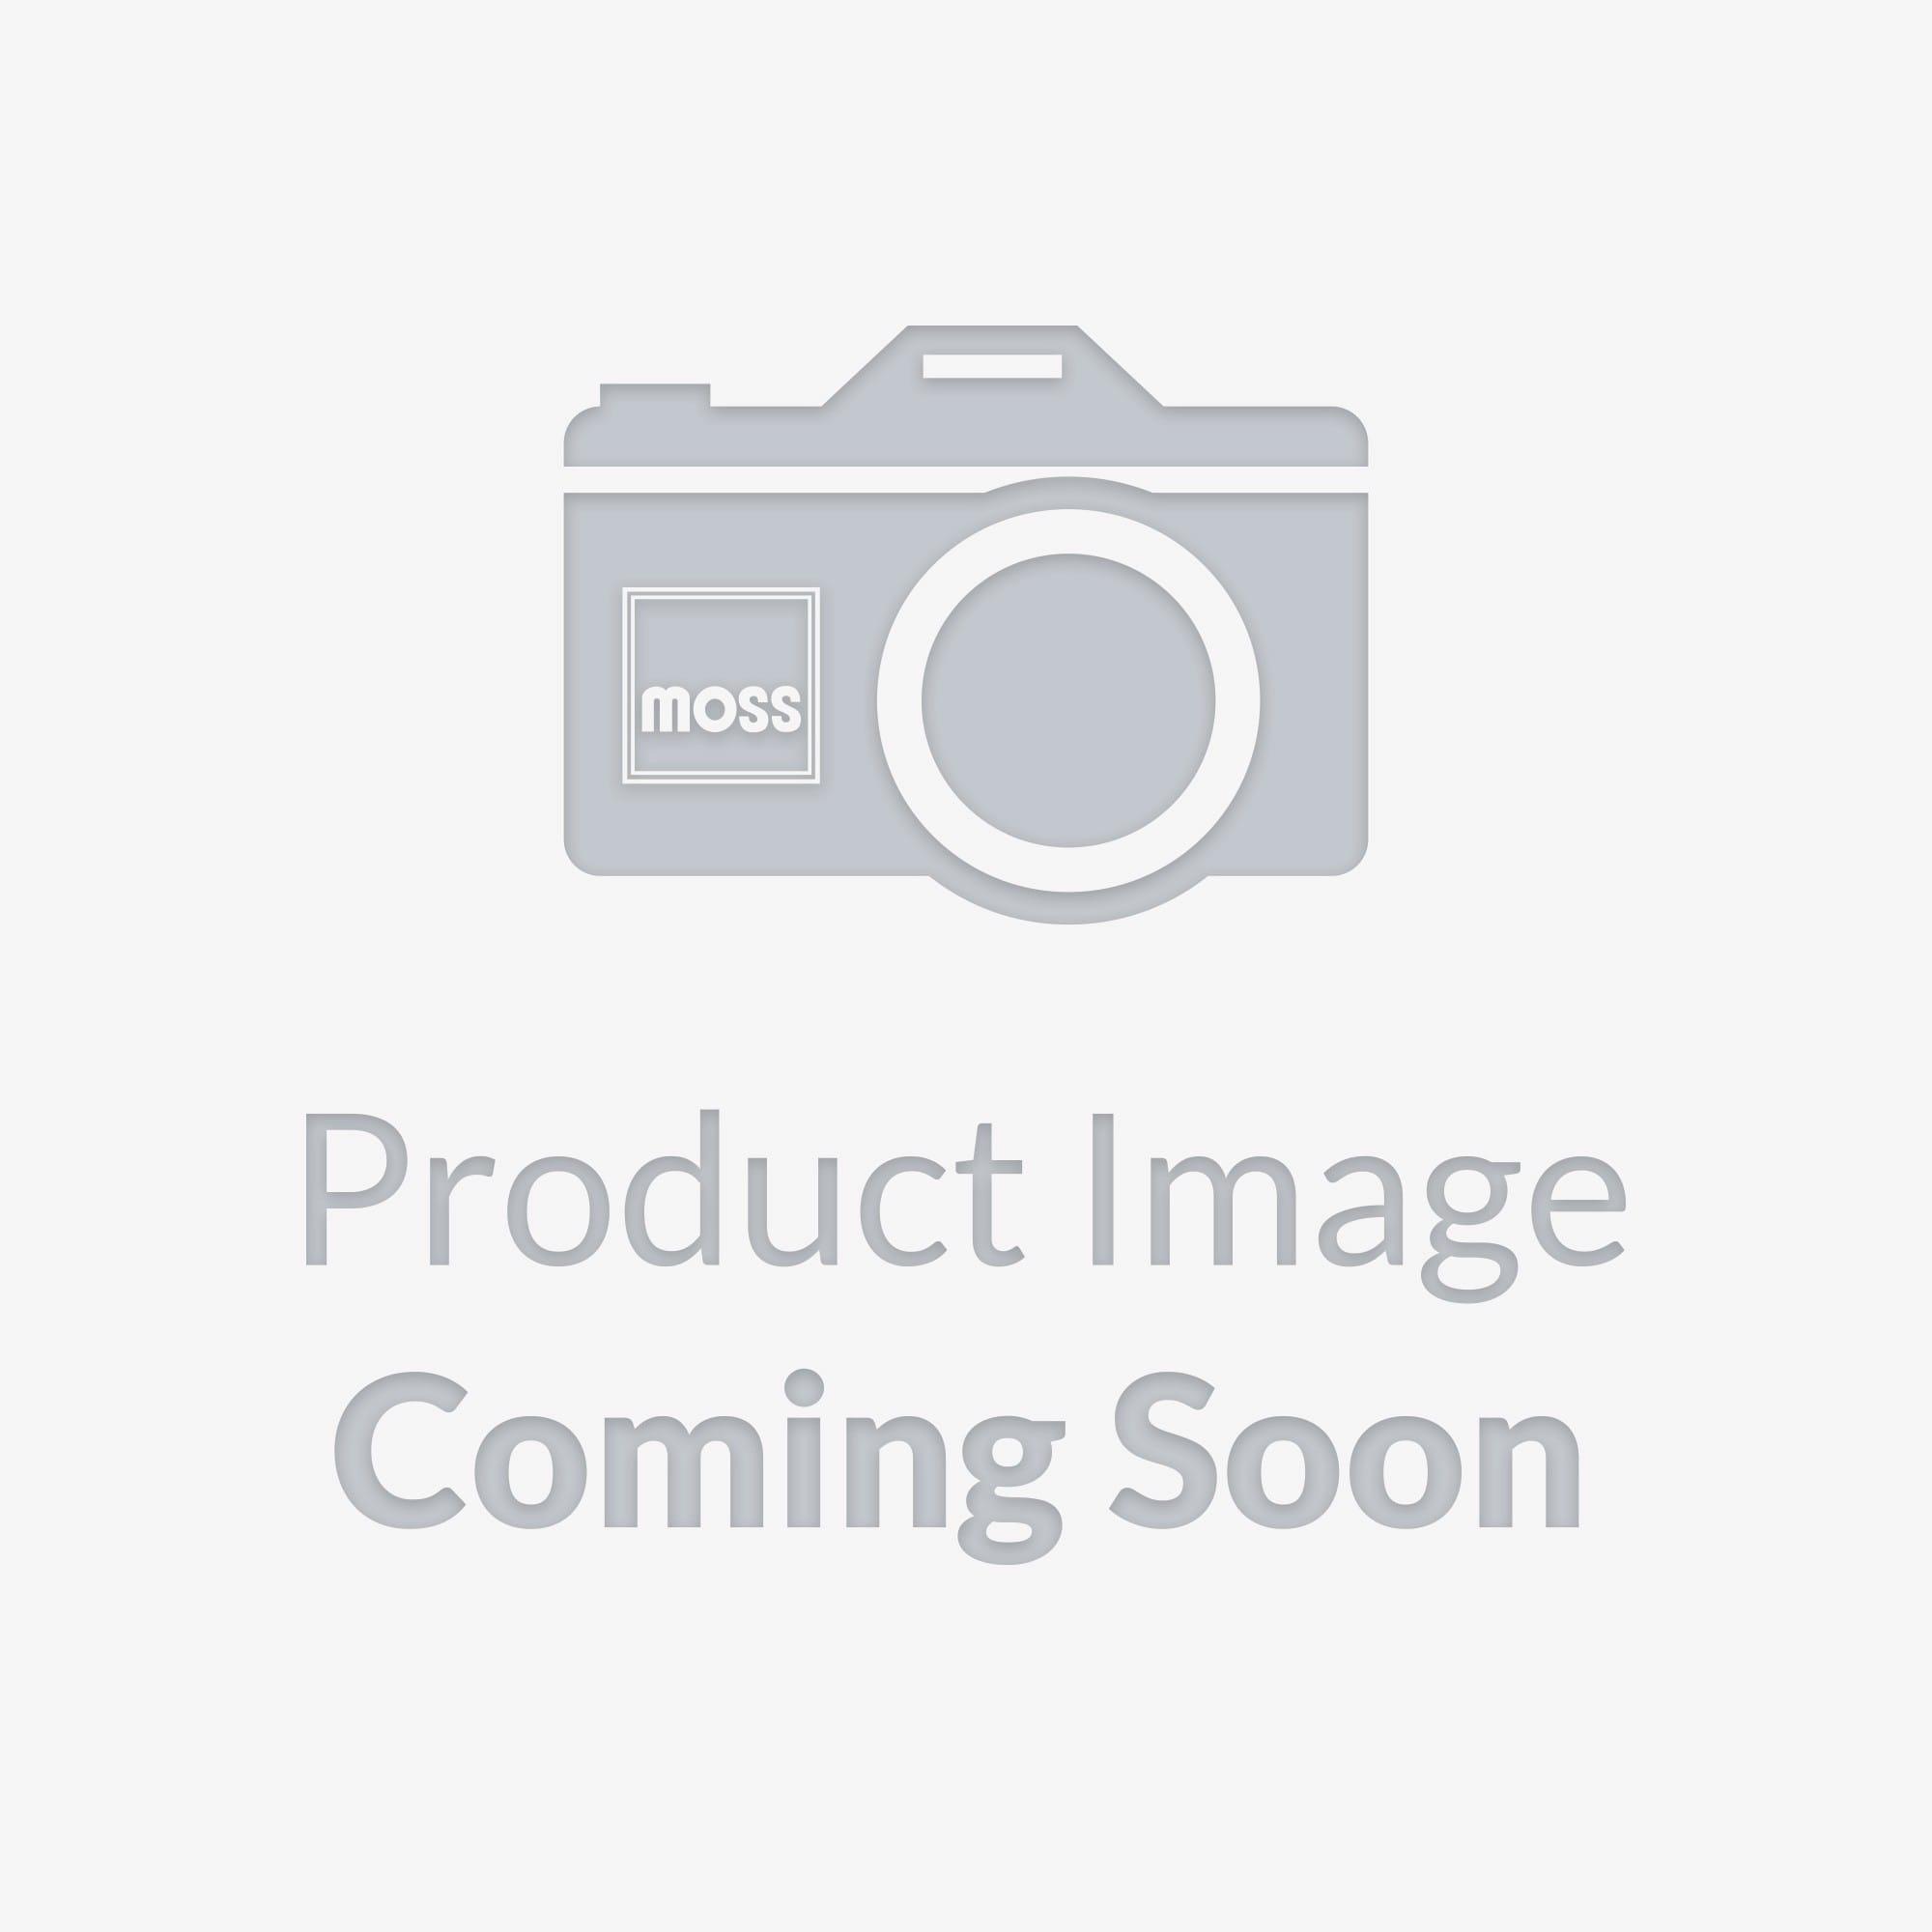 Mg midget minilite-2252